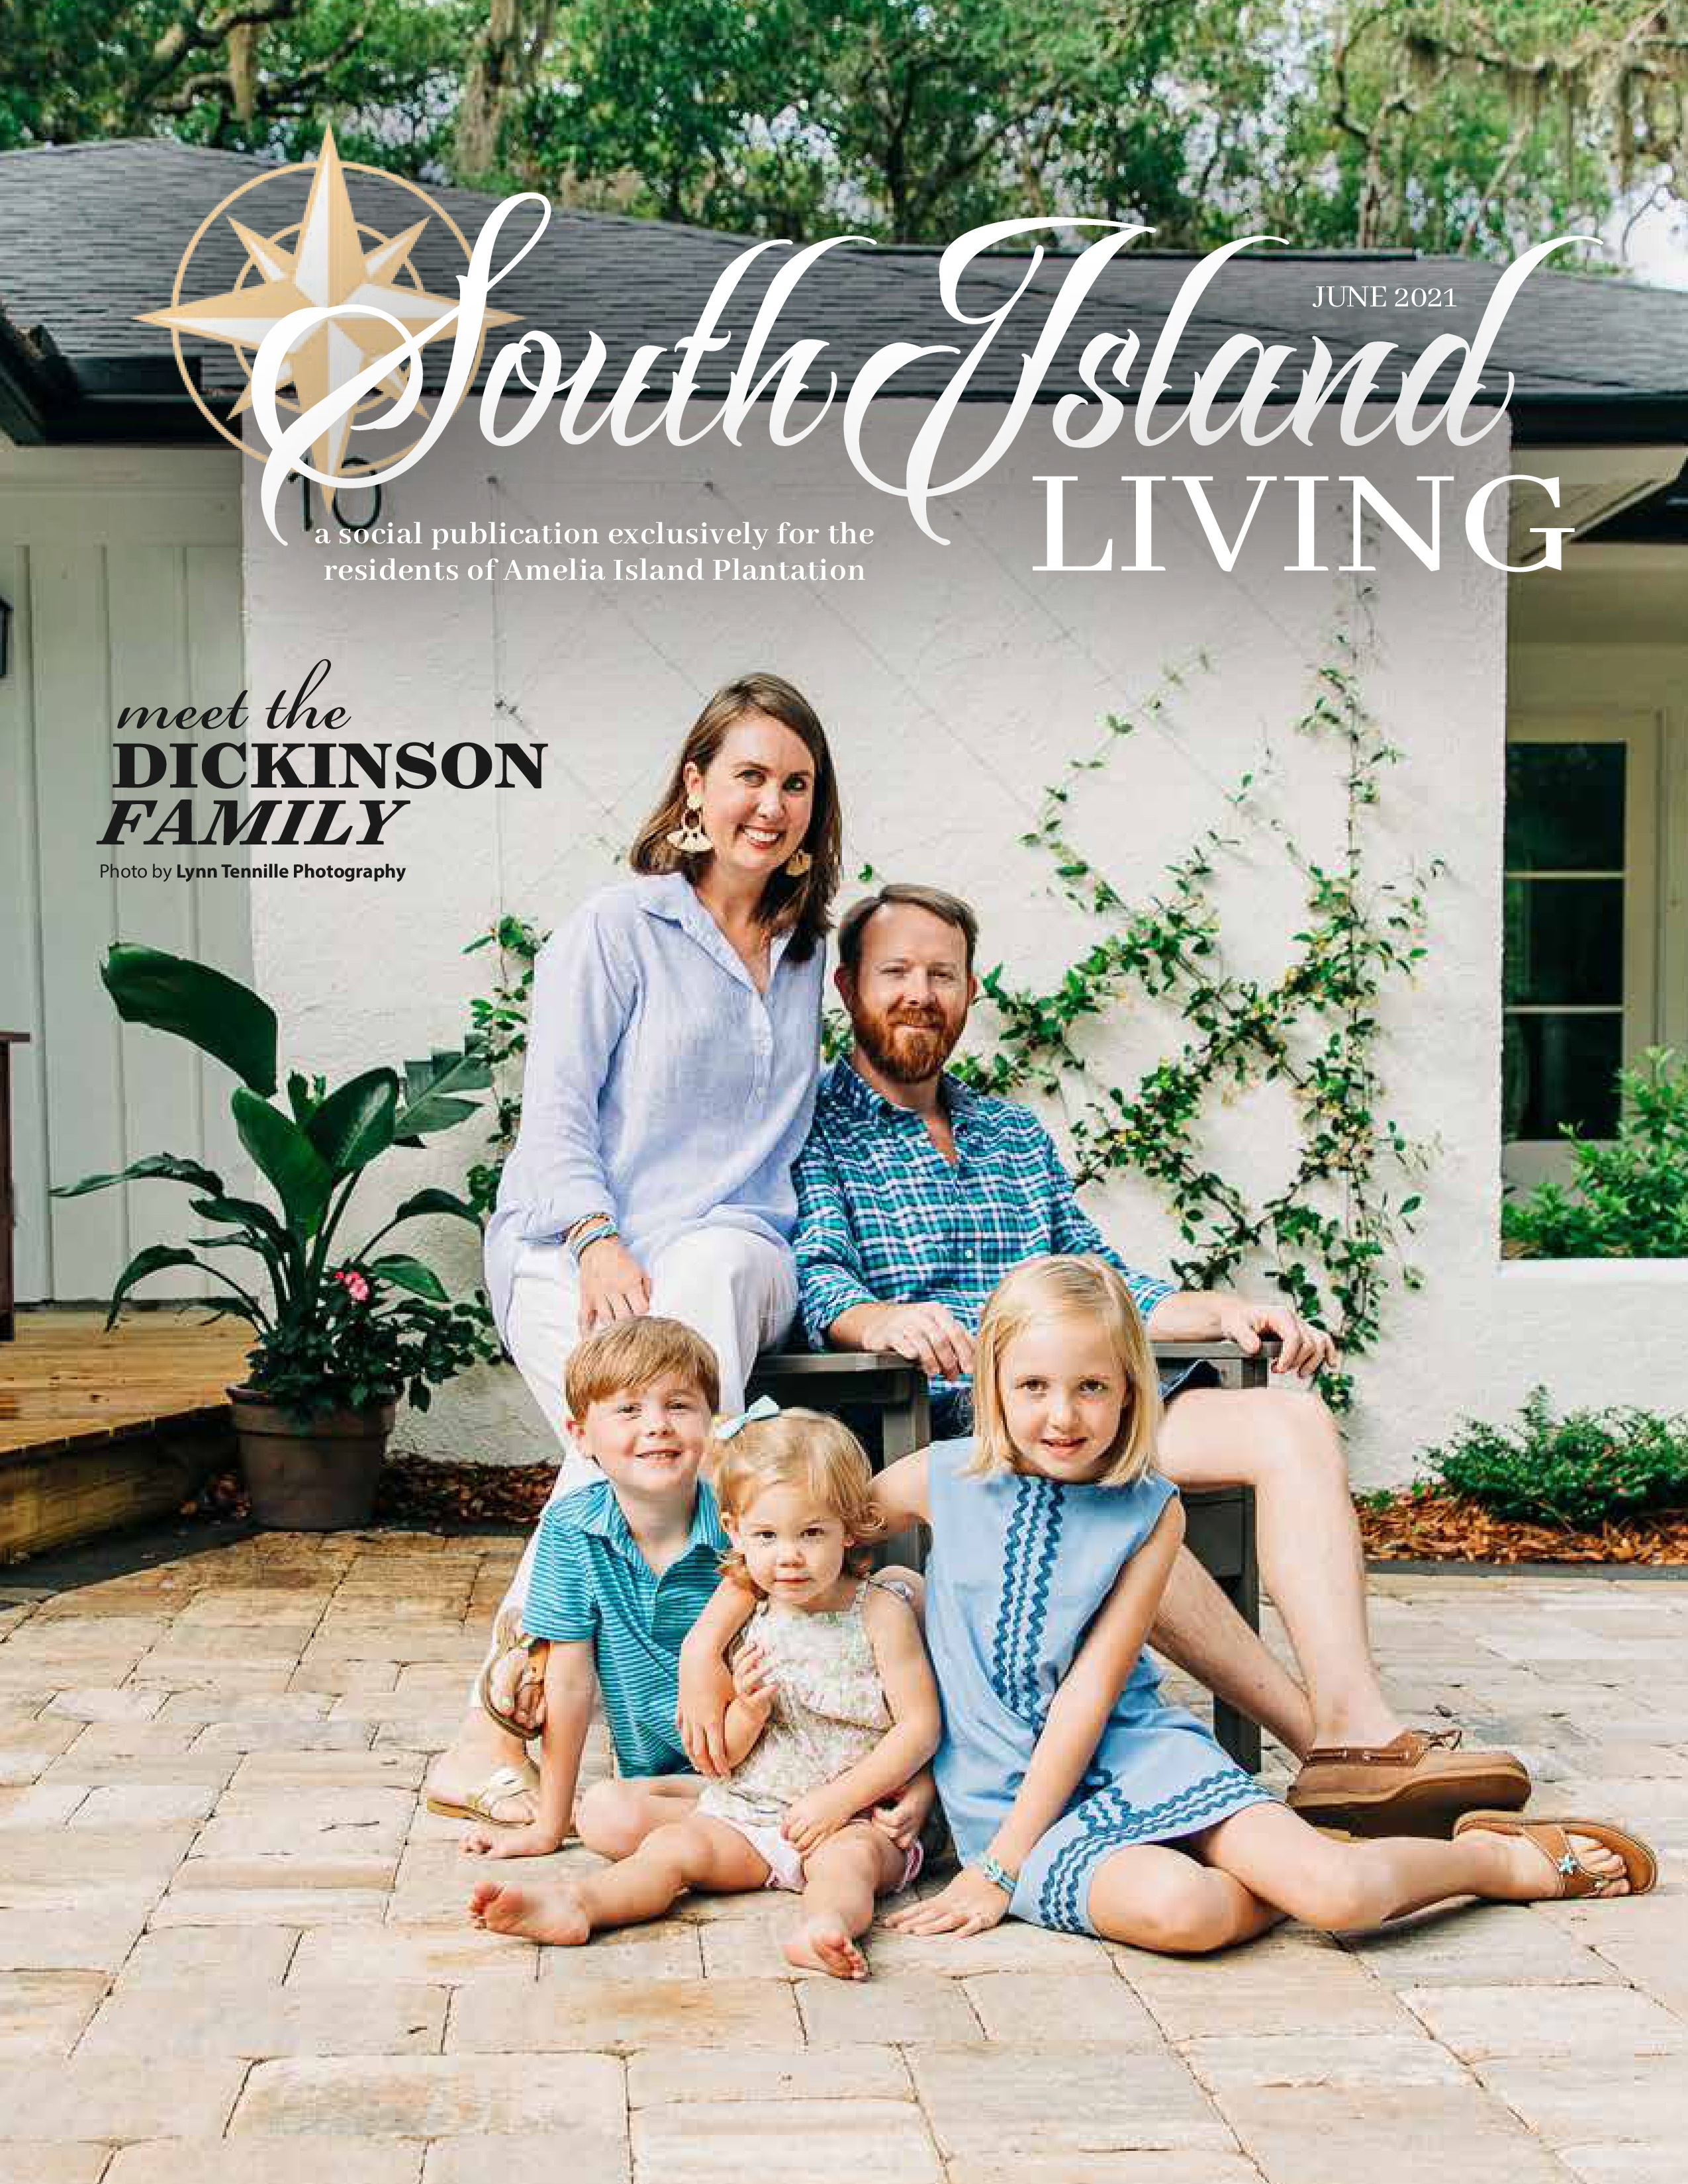 South Island Living 2021-06-01